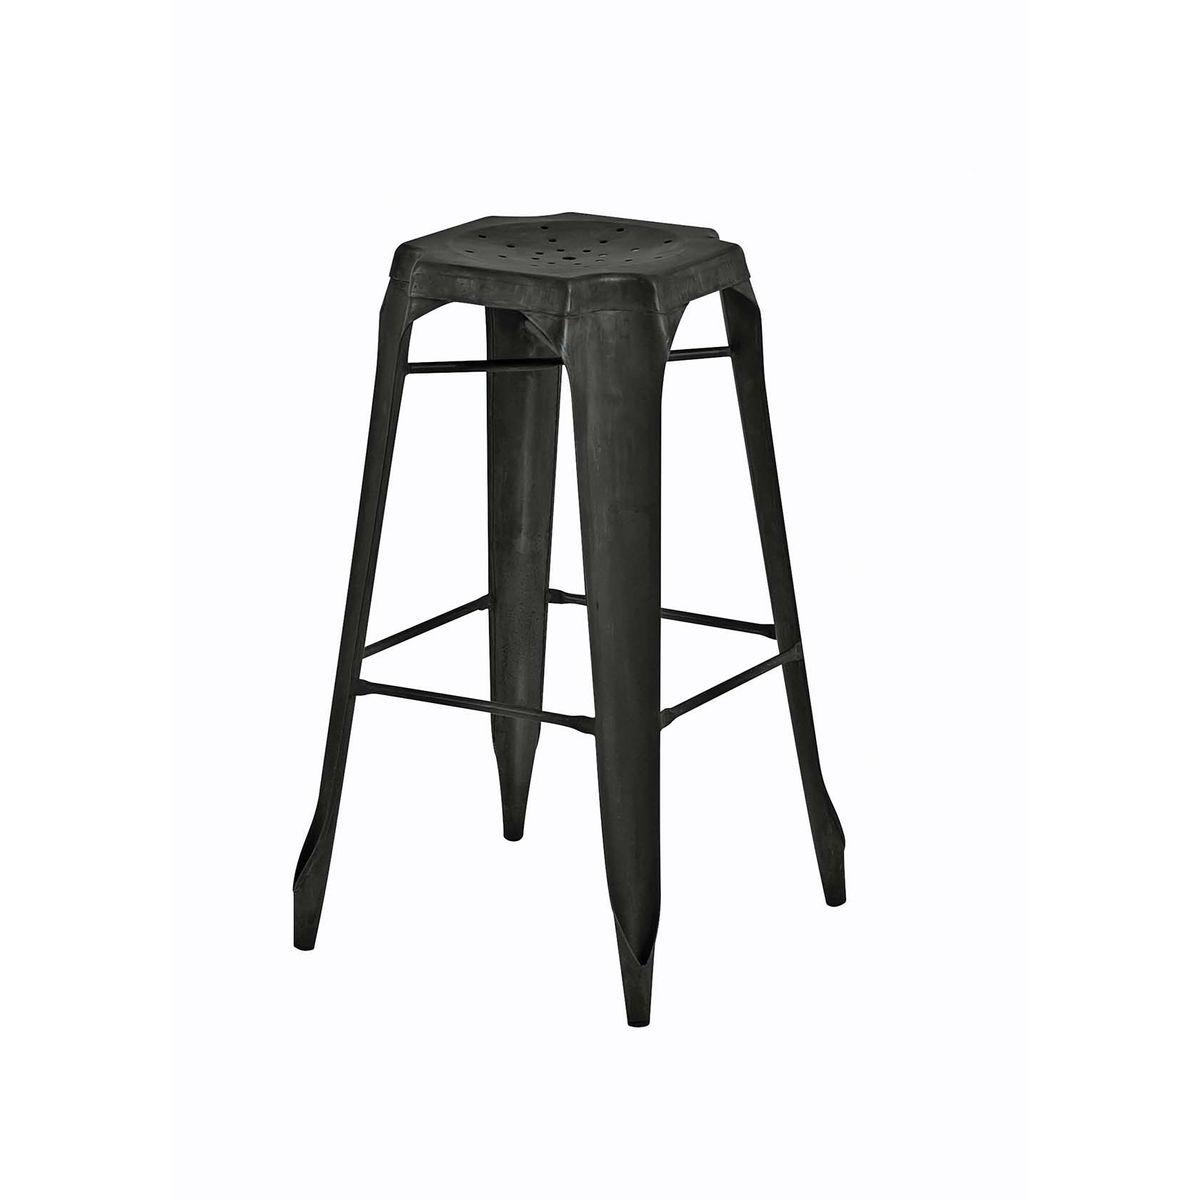 tabouret de bar industriel en mtal noir vieilli indus x2 - Tabouret De Bar Metal Industriel